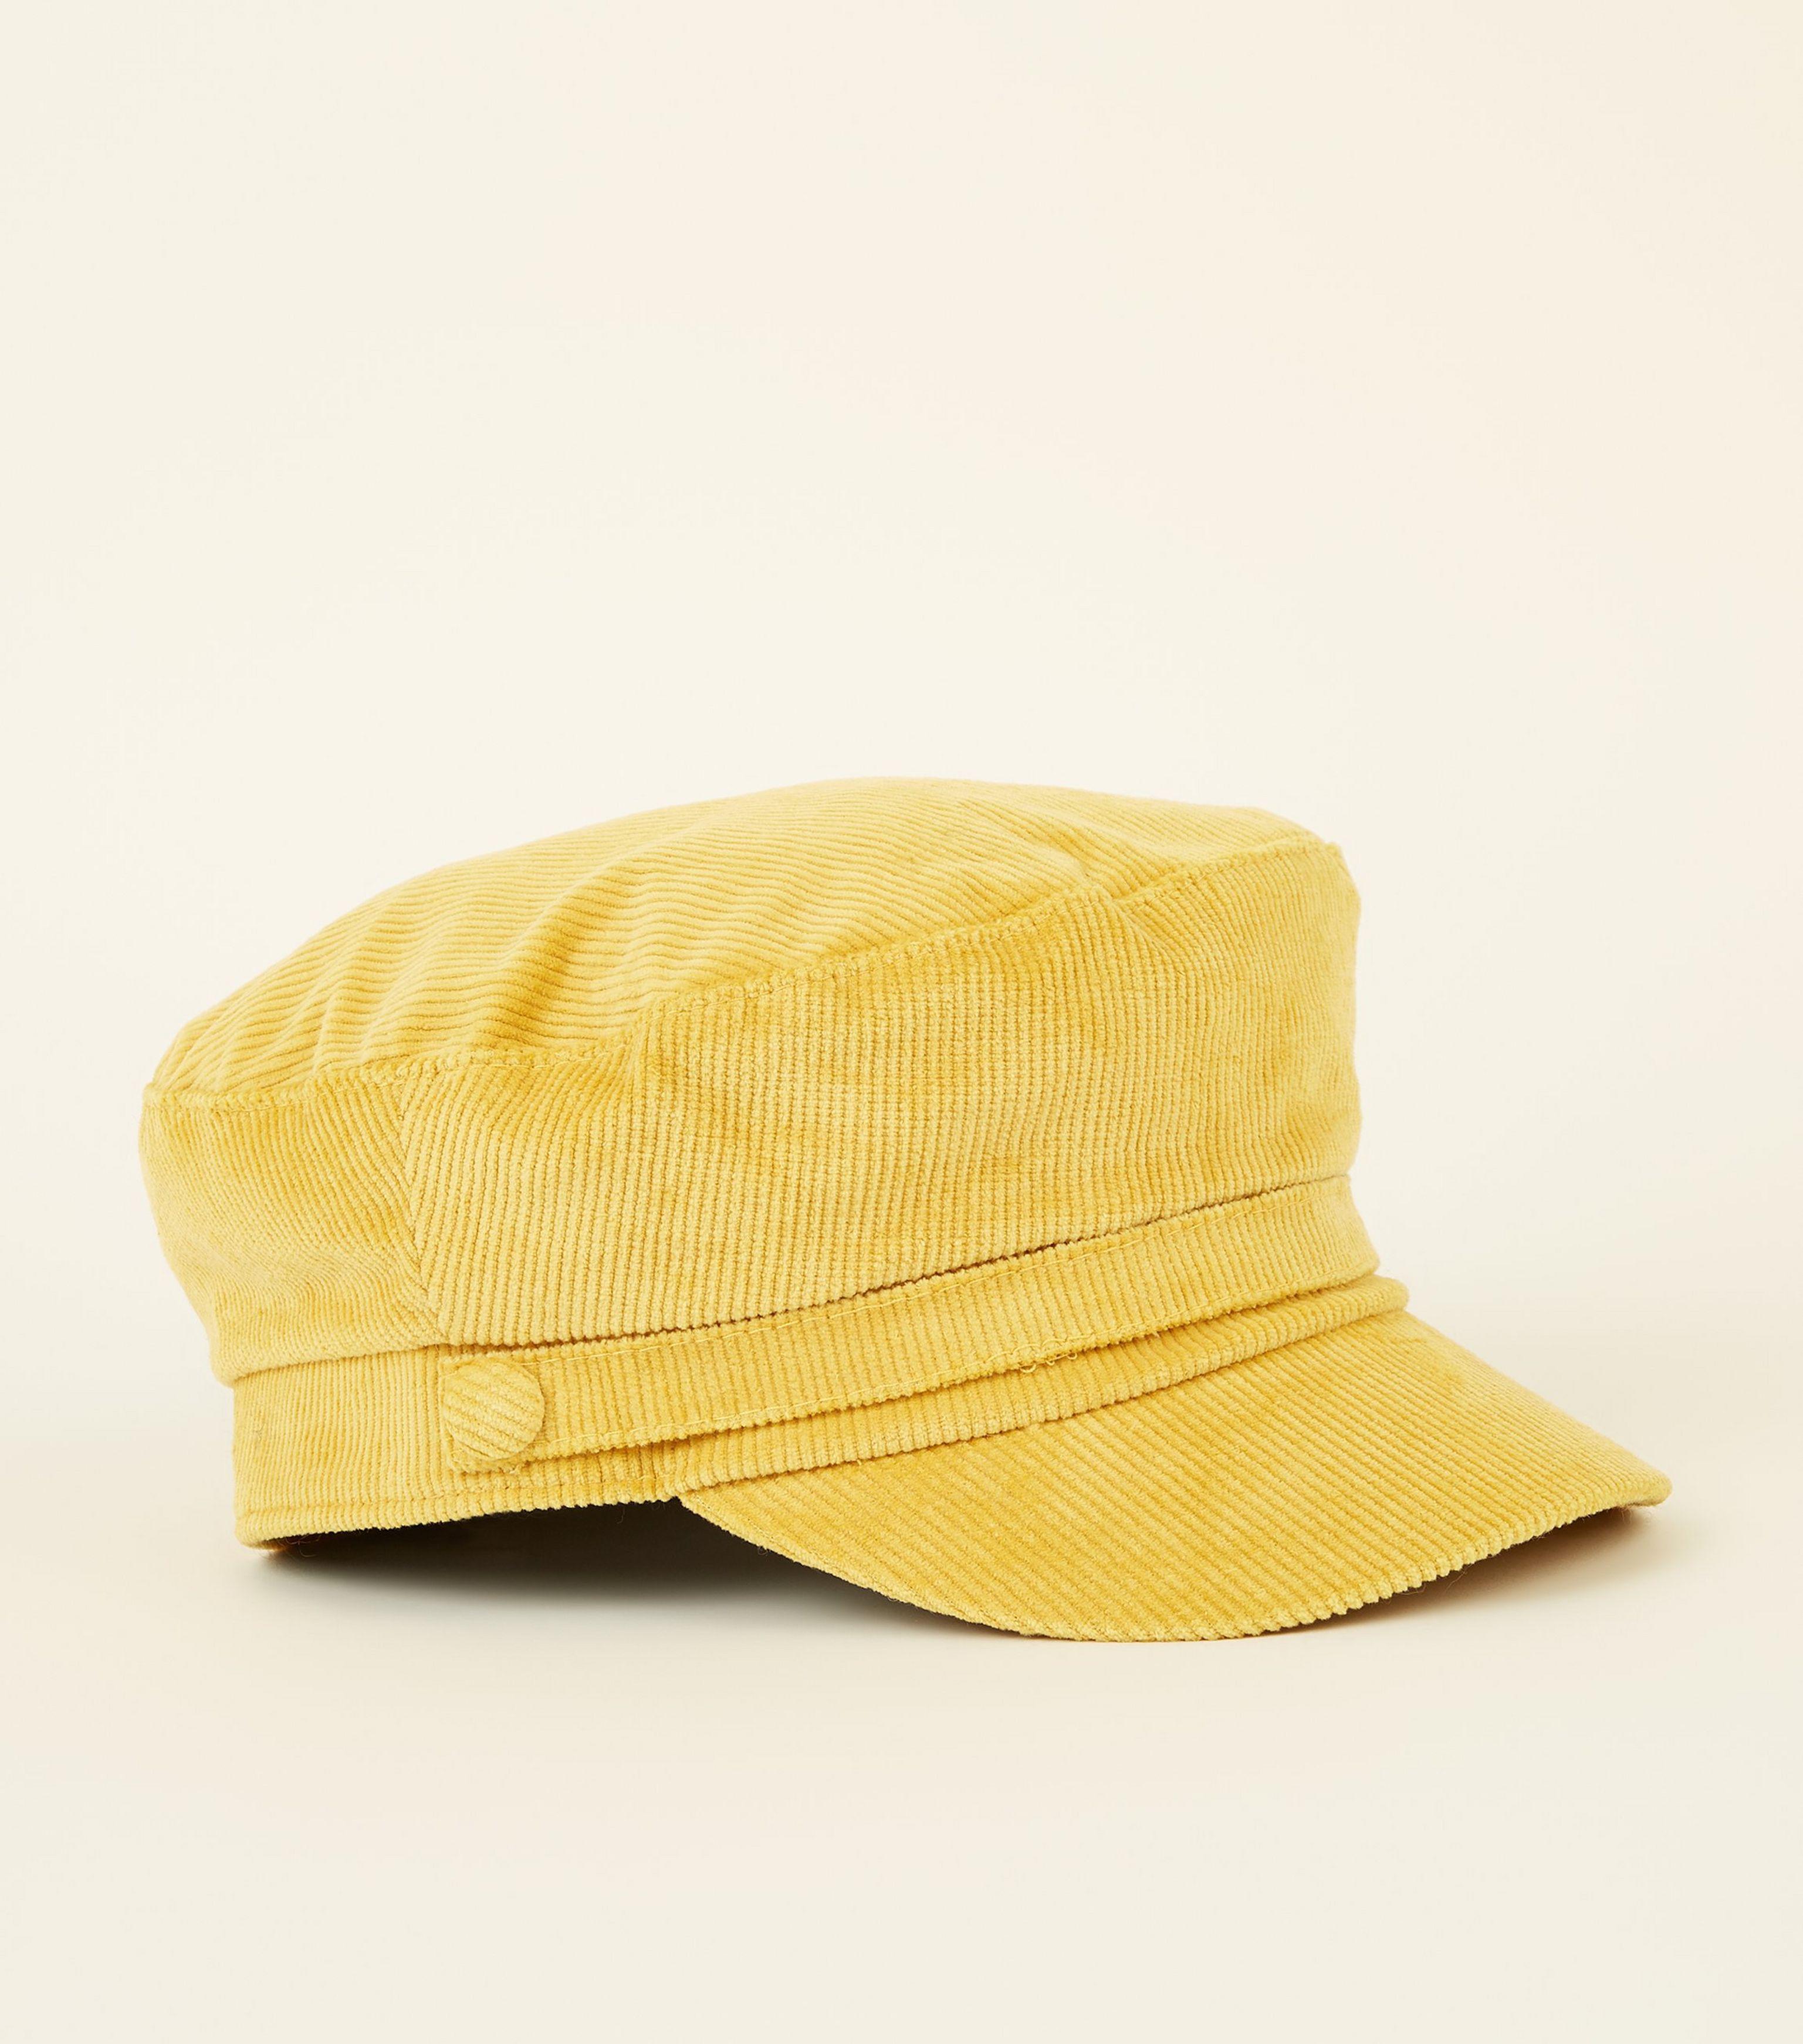 9b7bde54b56f8 New Look Yellow Corduroy Military Baker Boy Cap in Yellow - Lyst